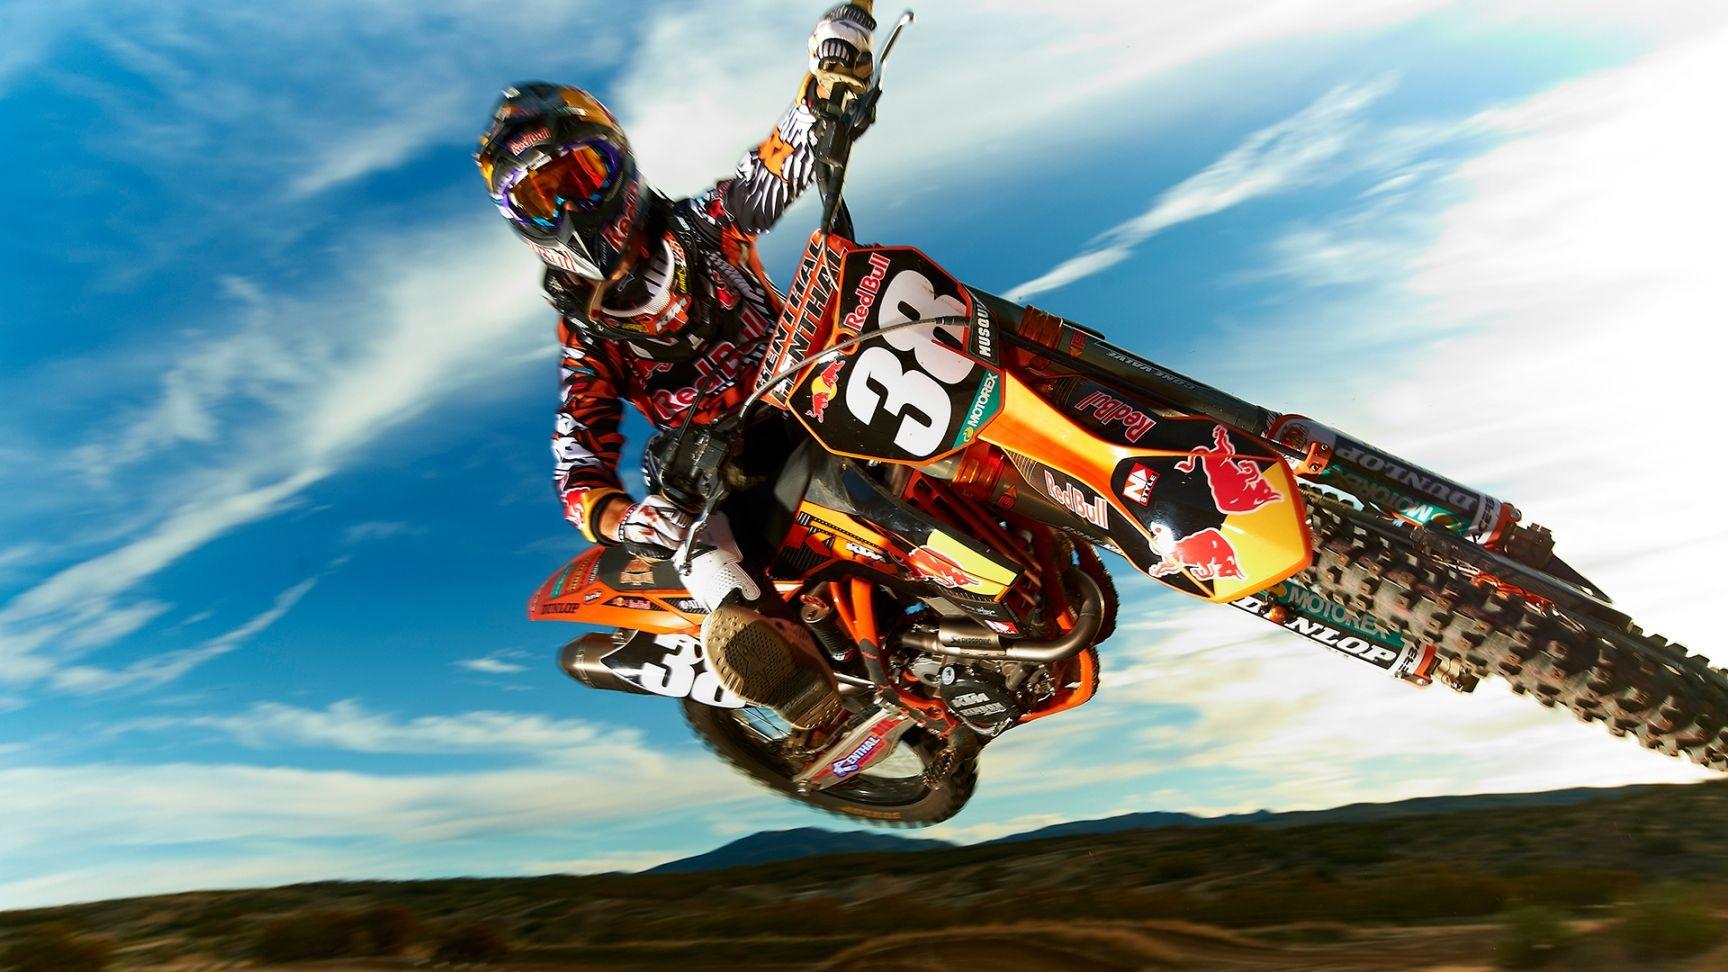 Download Dirt Bikes 2345 1728x972 Px High Resolution Wallpaper Motocross Motor Trail Dirtbikes